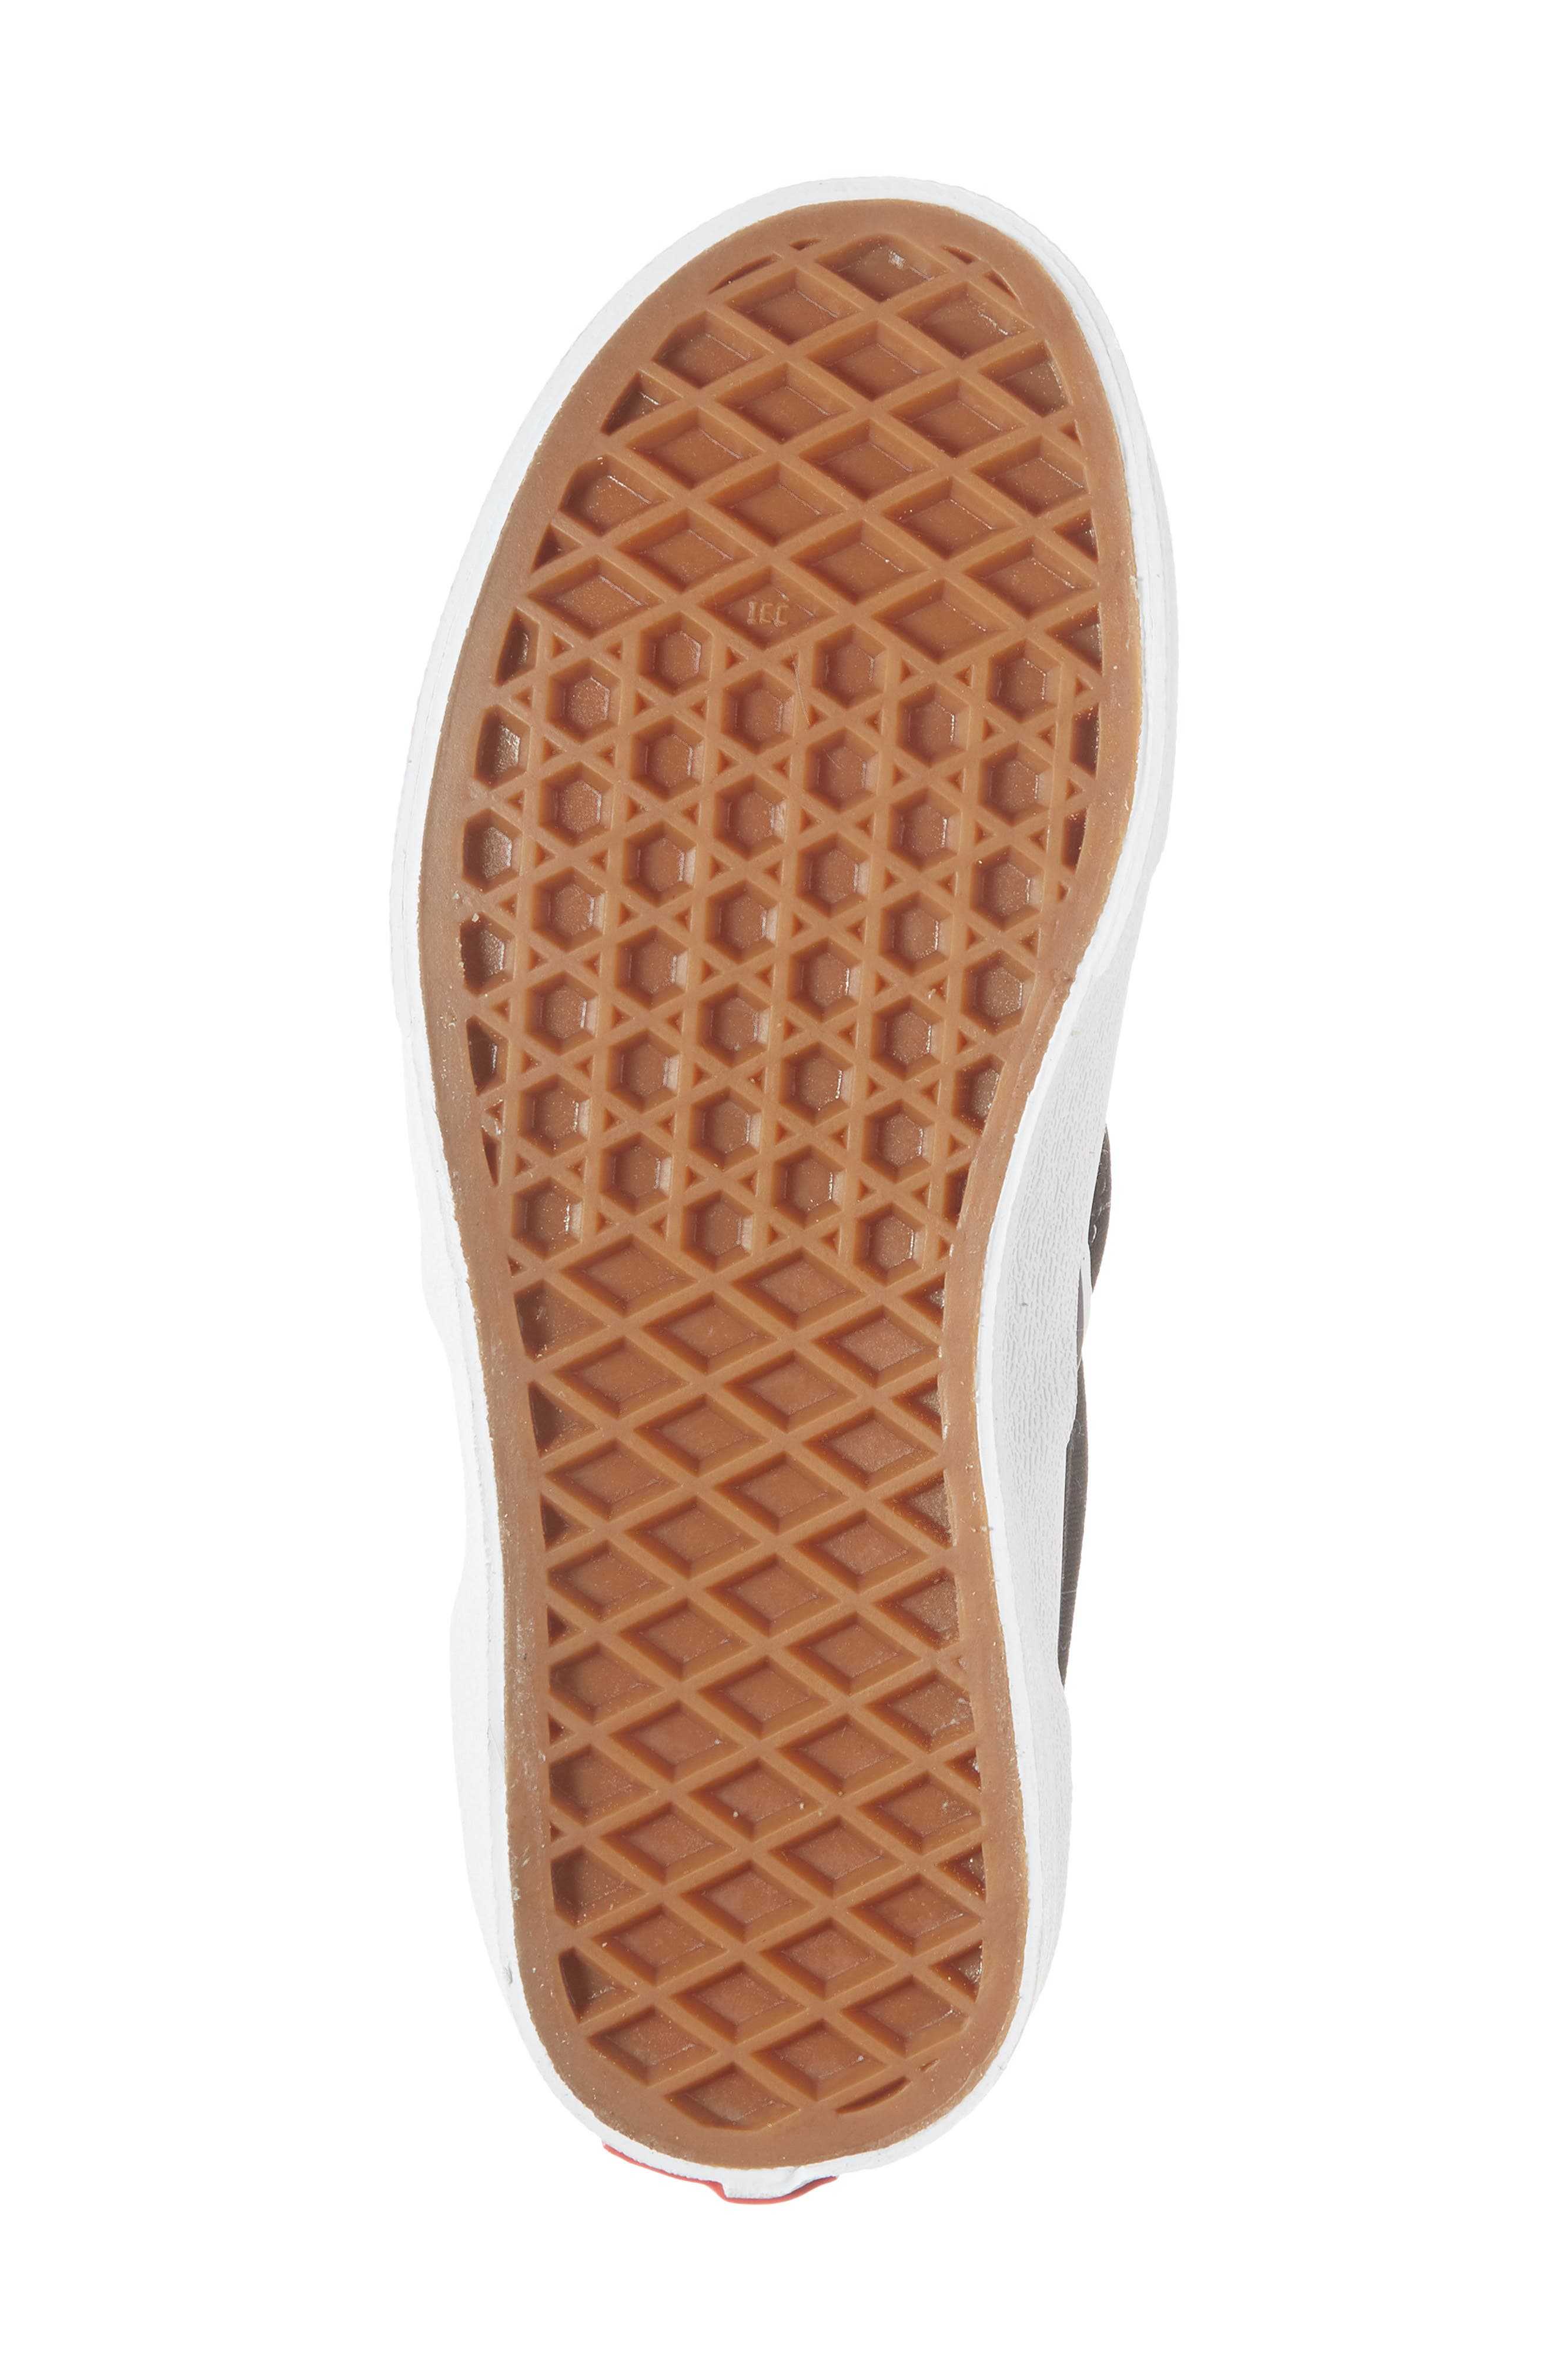 Party Check Slip-On Sneaker,                             Alternate thumbnail 6, color,                             Party Checker Multi/ Black